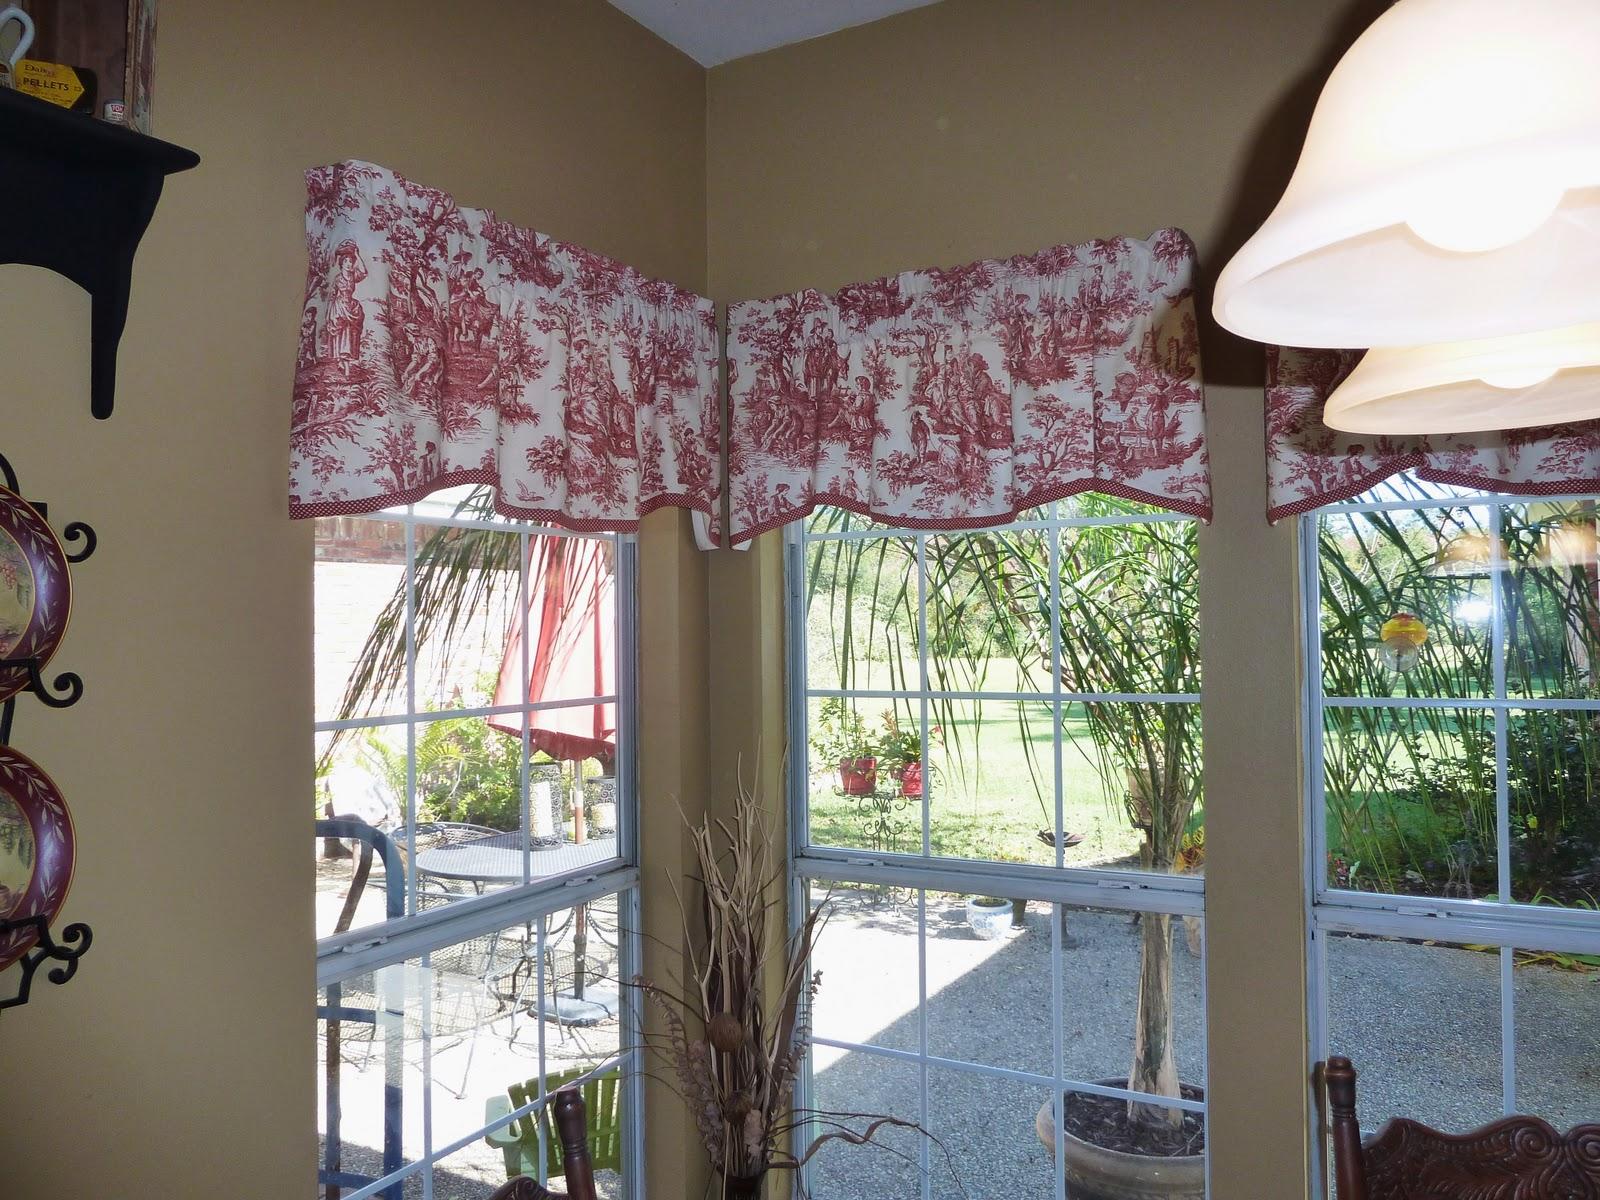 Kitchen Curtain Fabric For Sale 13 Gallon Trash Can Beaucoup Joie De Vivre Red Toile Curtains